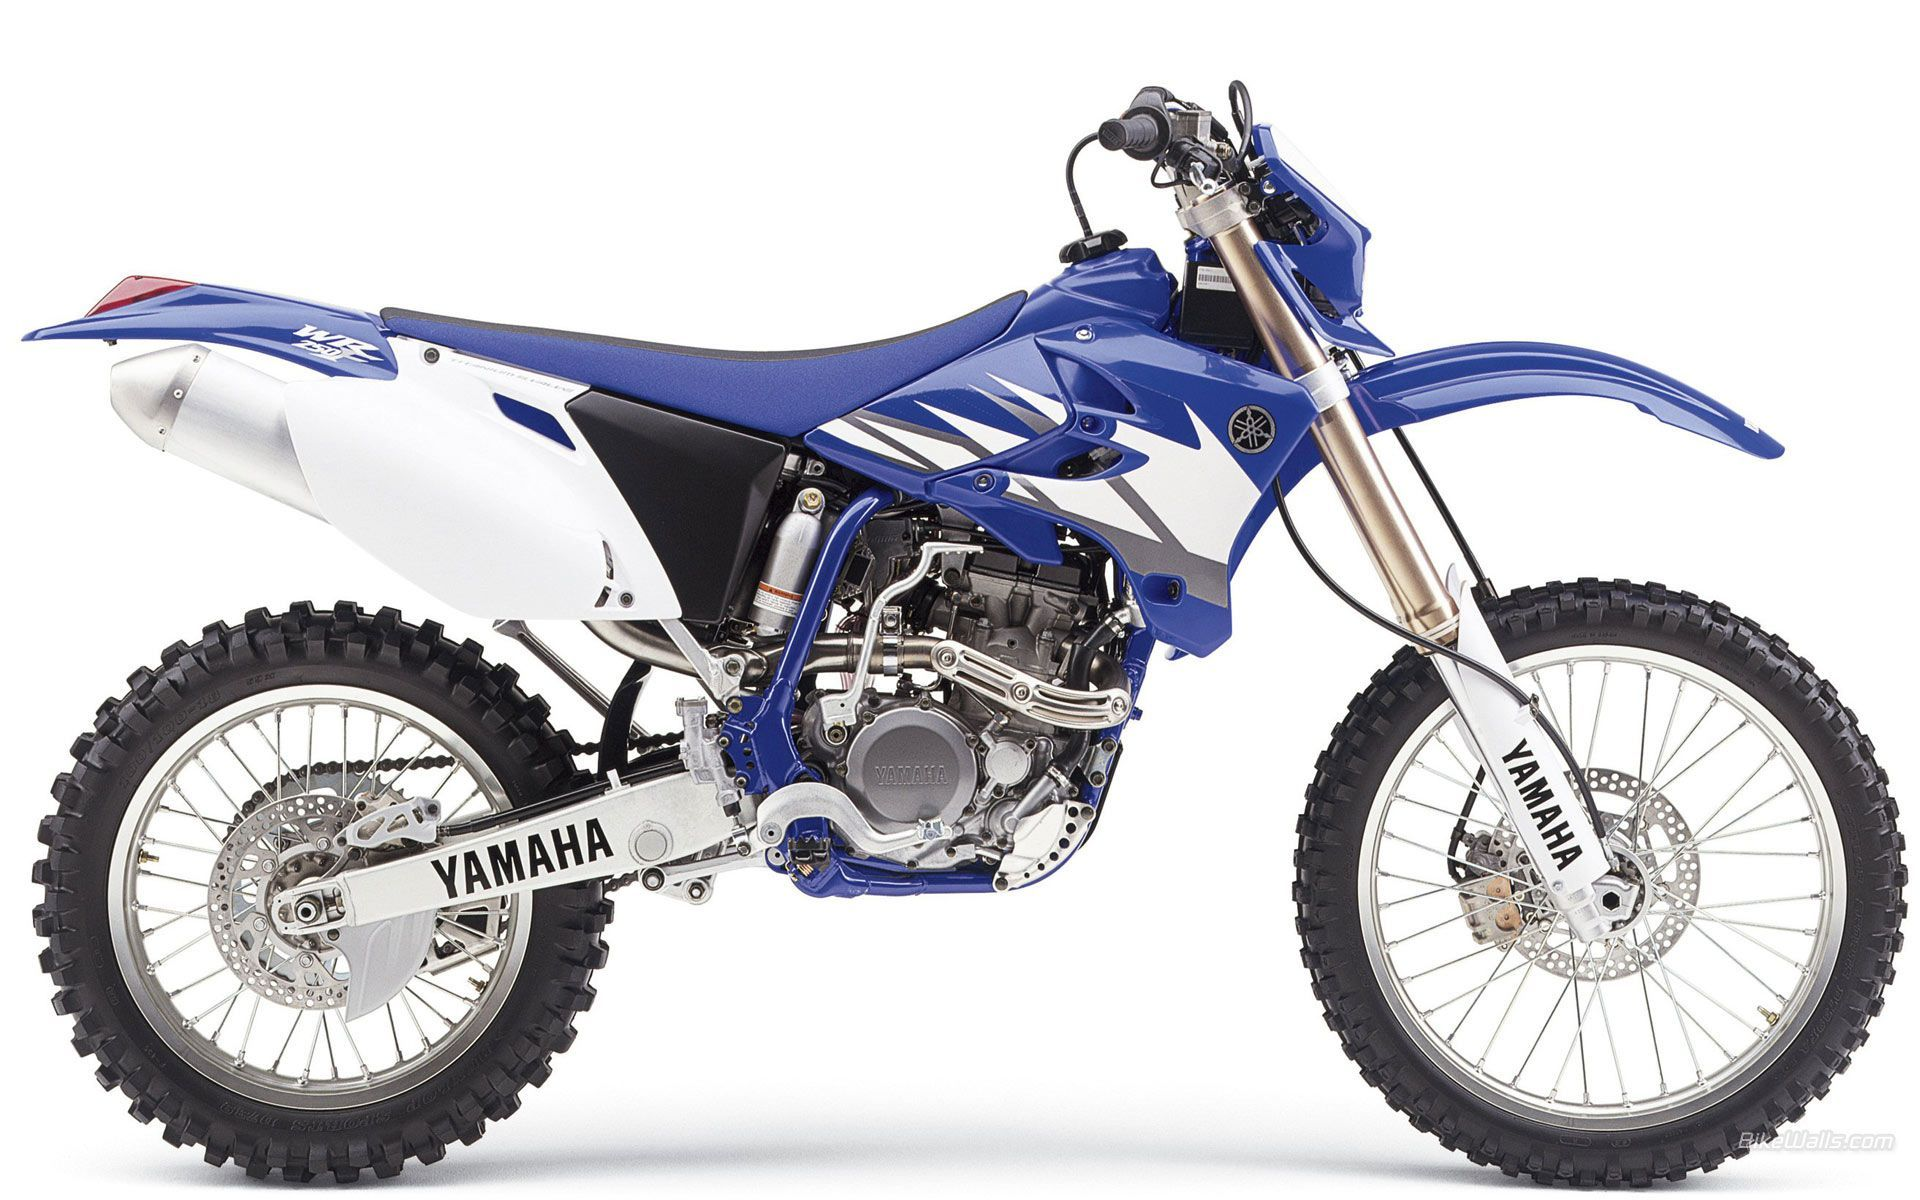 Yamaha Wr 250 F Yamaha Wr Motorcycles For Sale Yamaha Motor